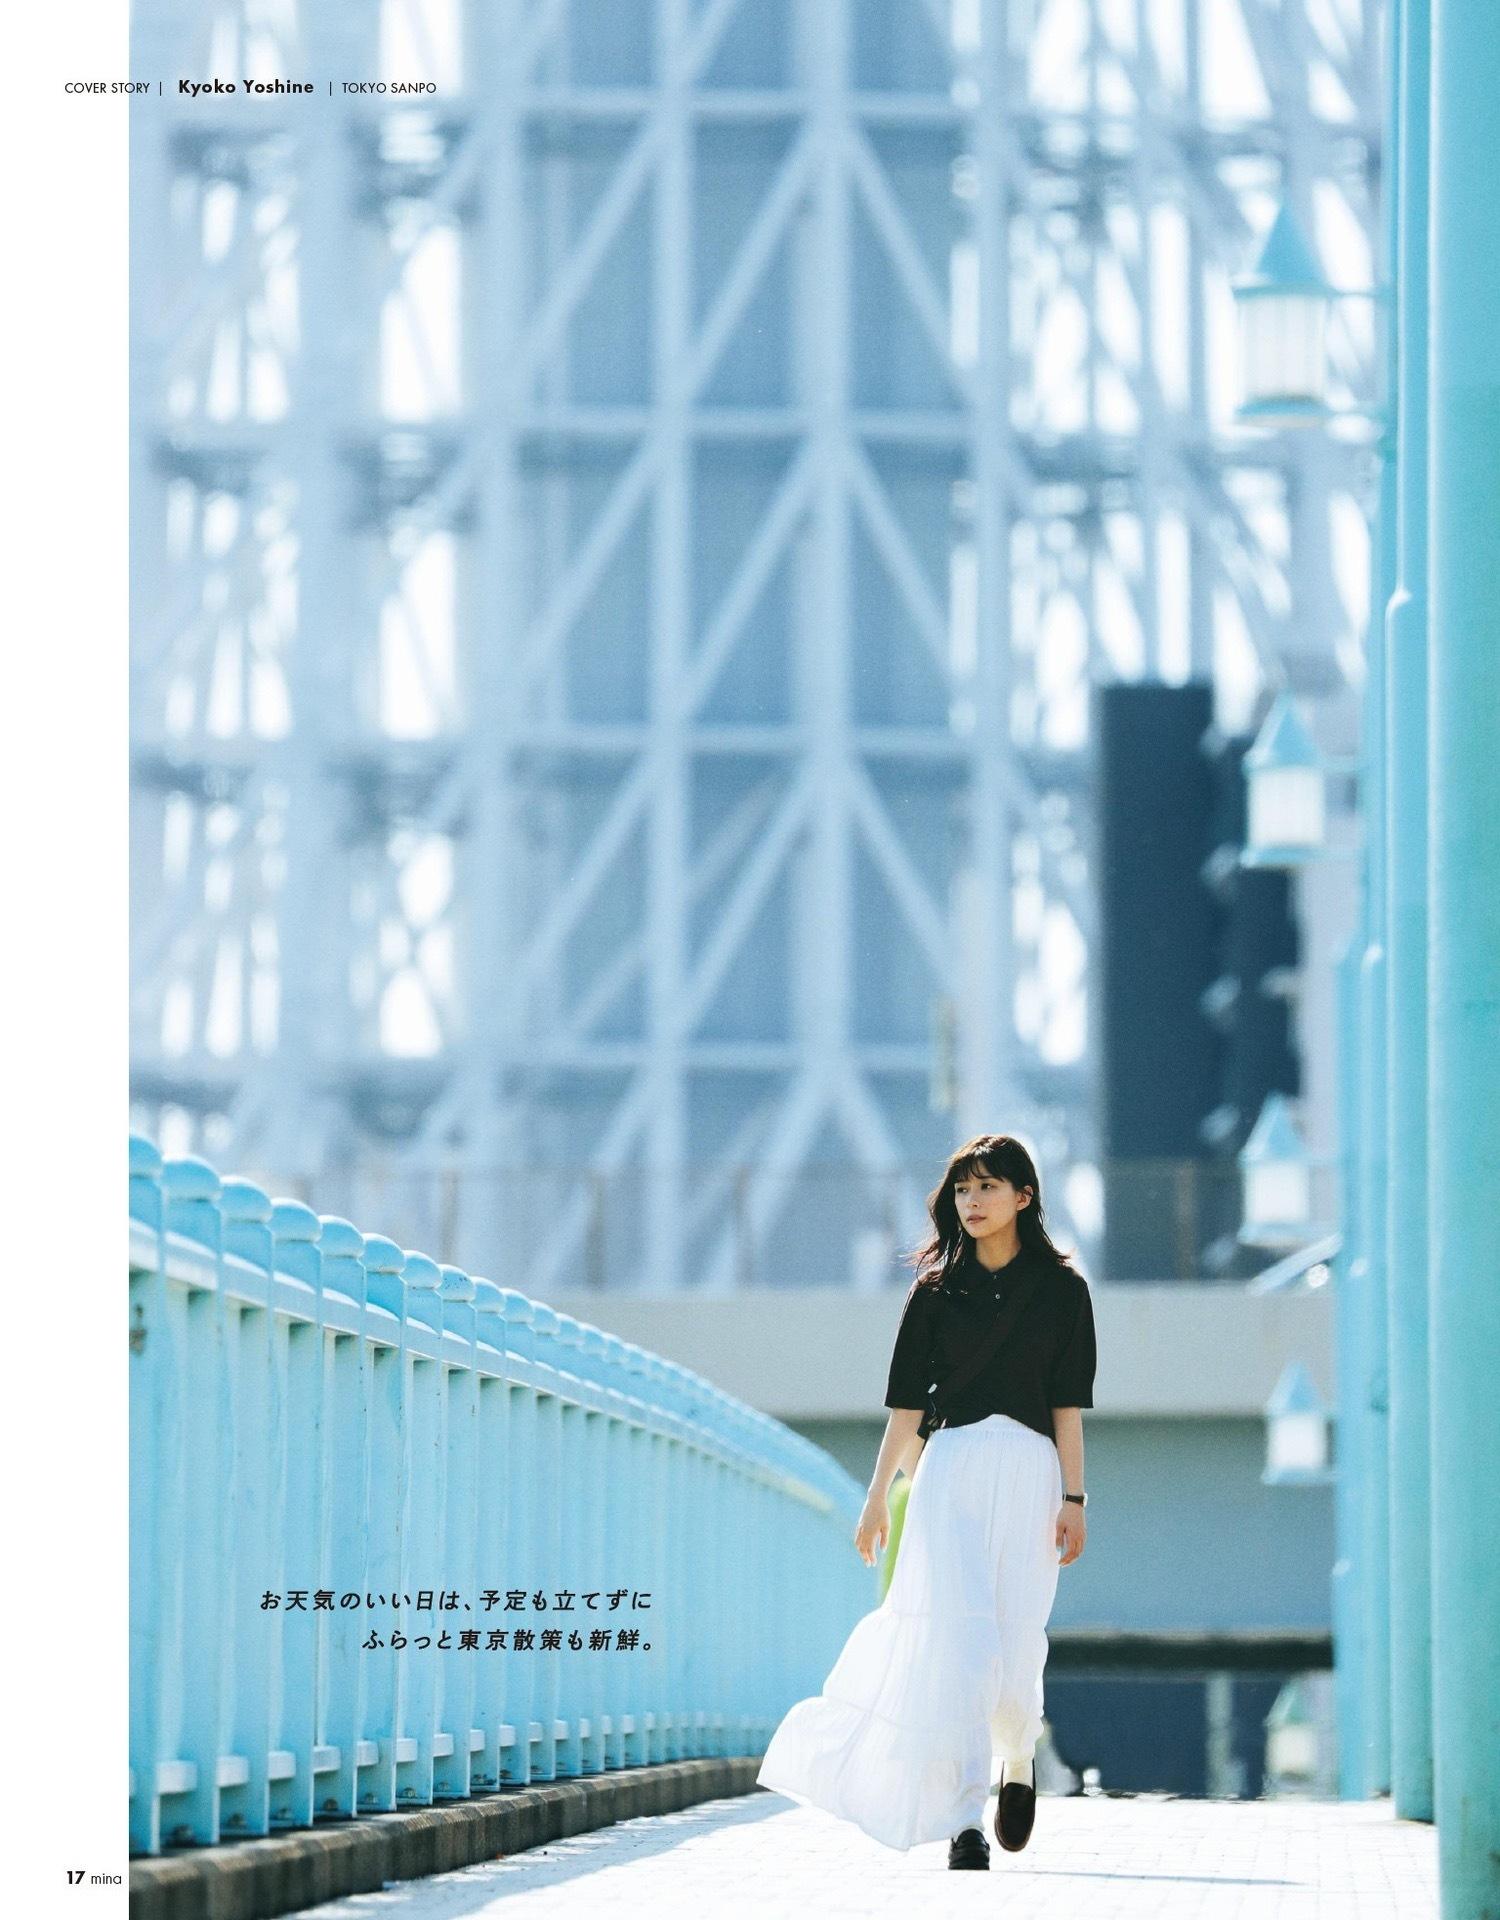 itotii-喵喵女·喵妹子写真专辑(第8辑)